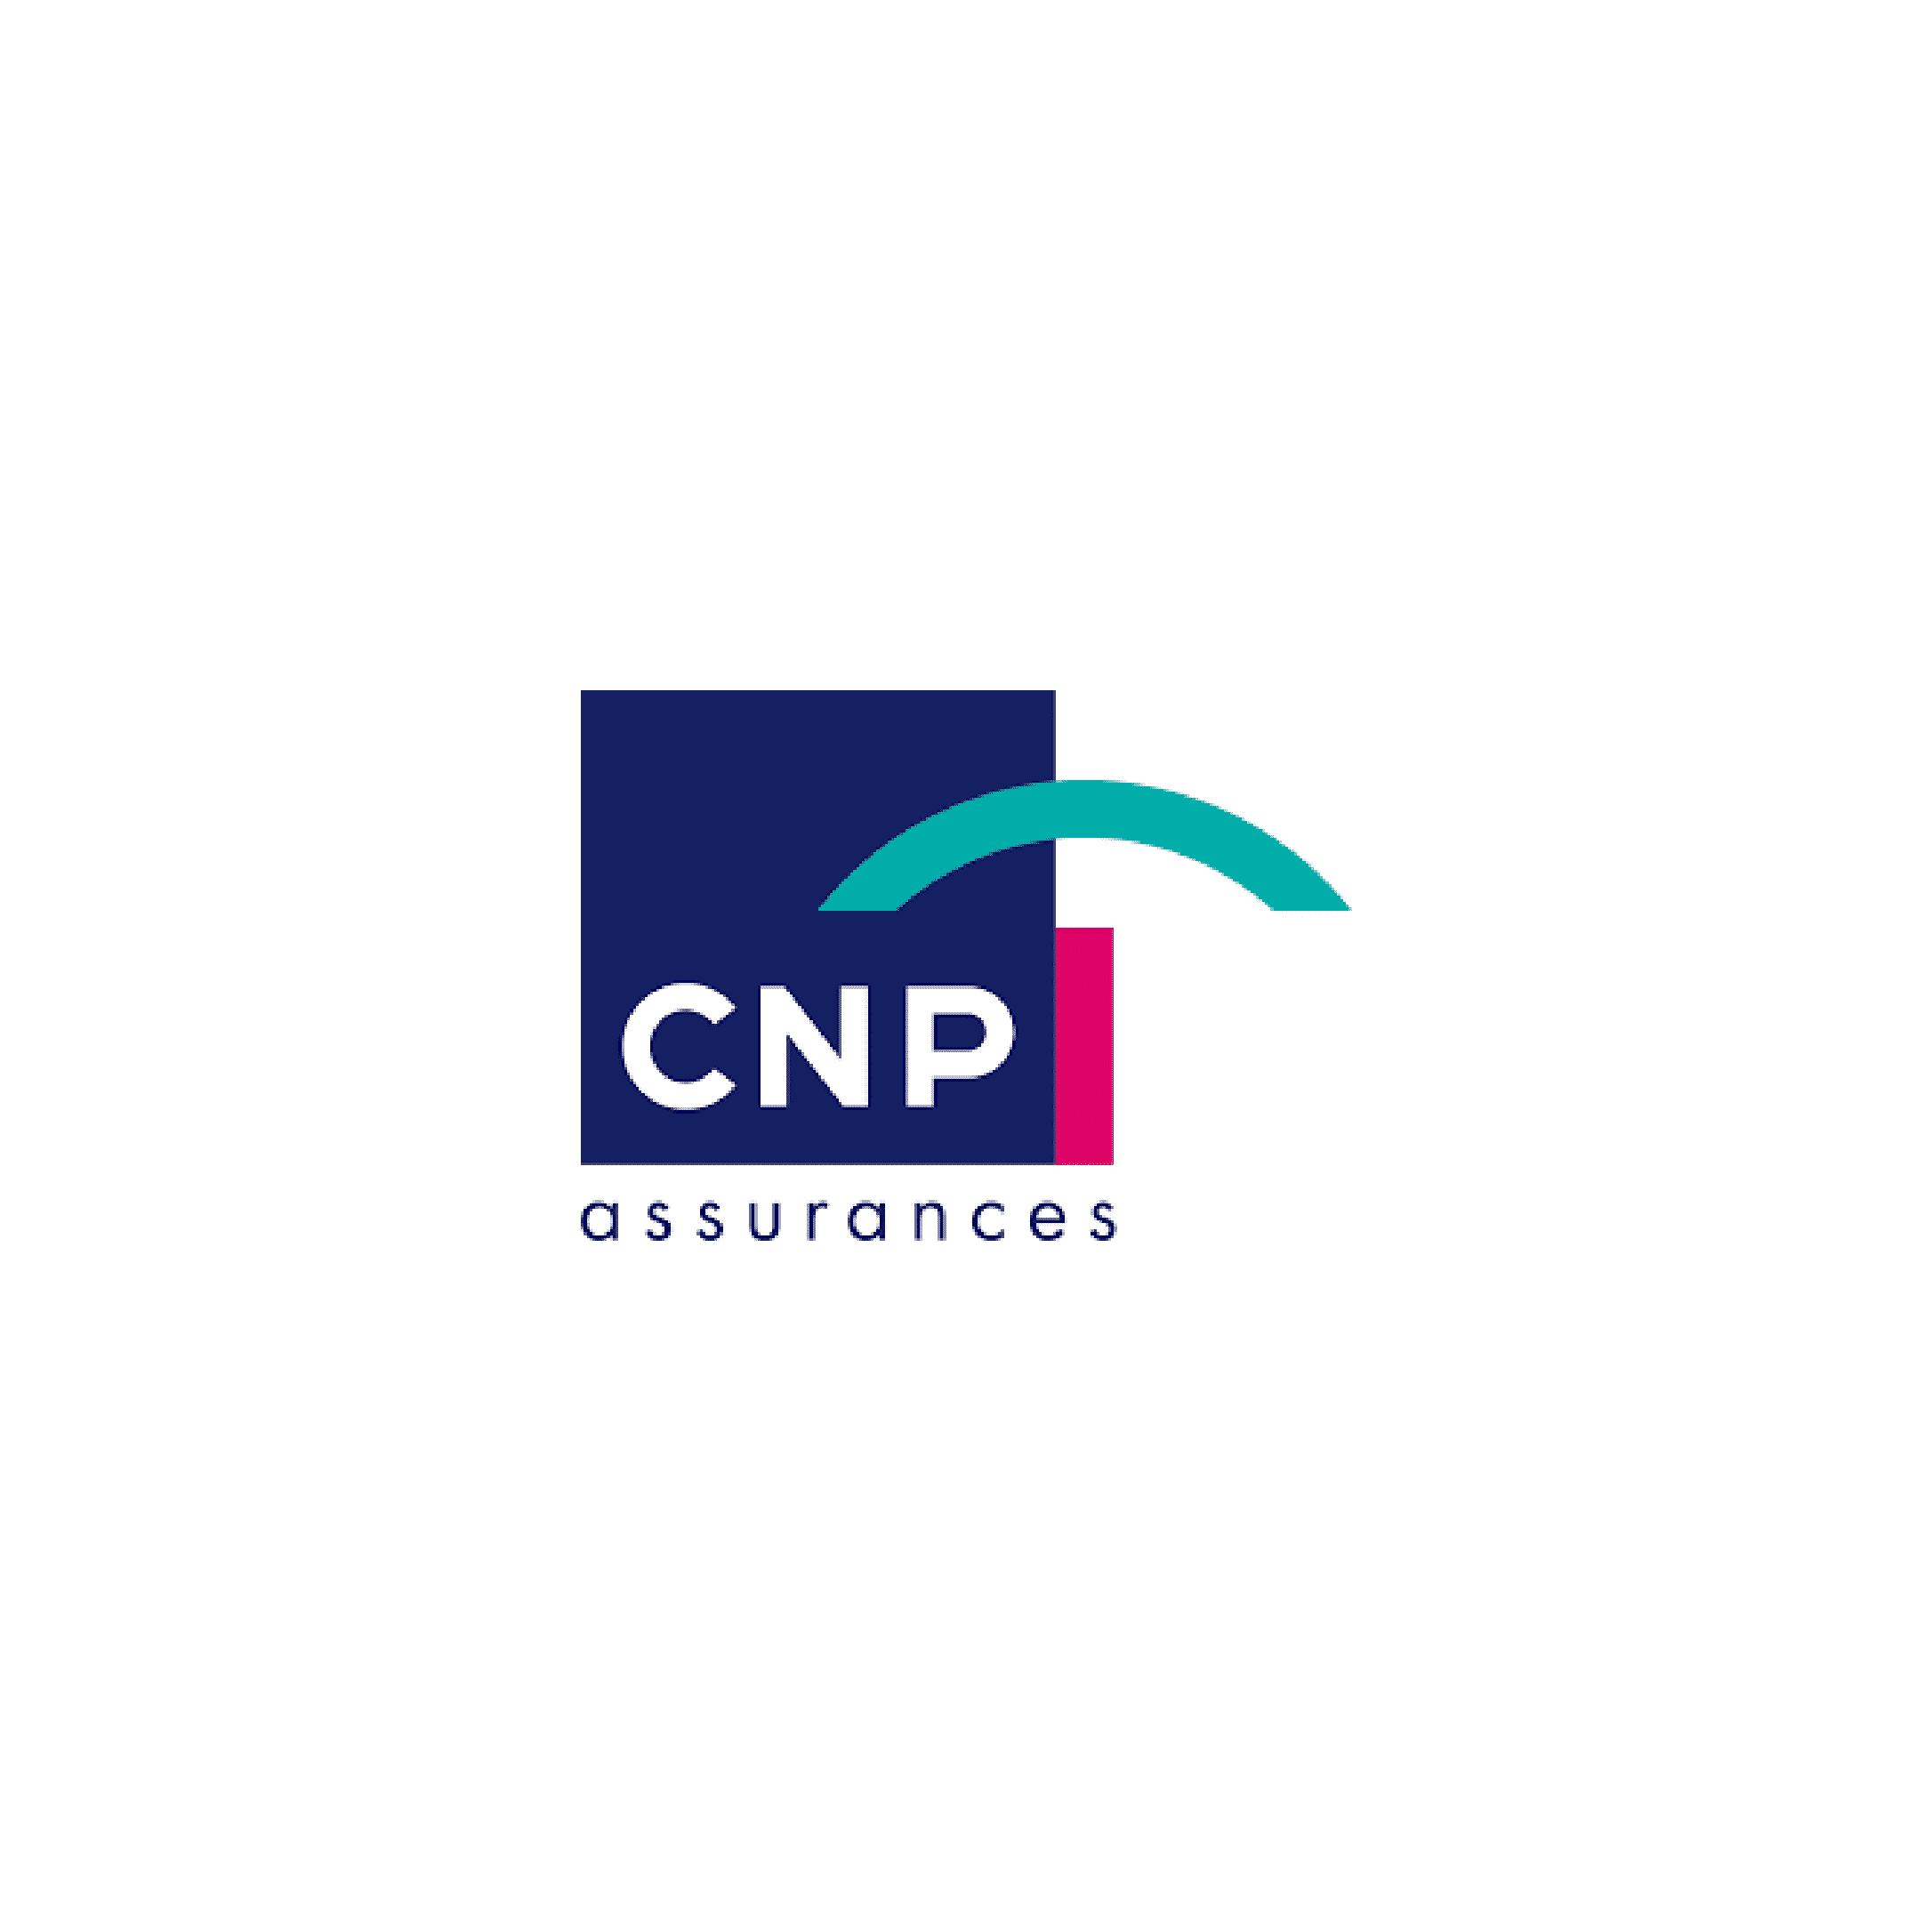 DialOnce-CNP-Logo-Assurance